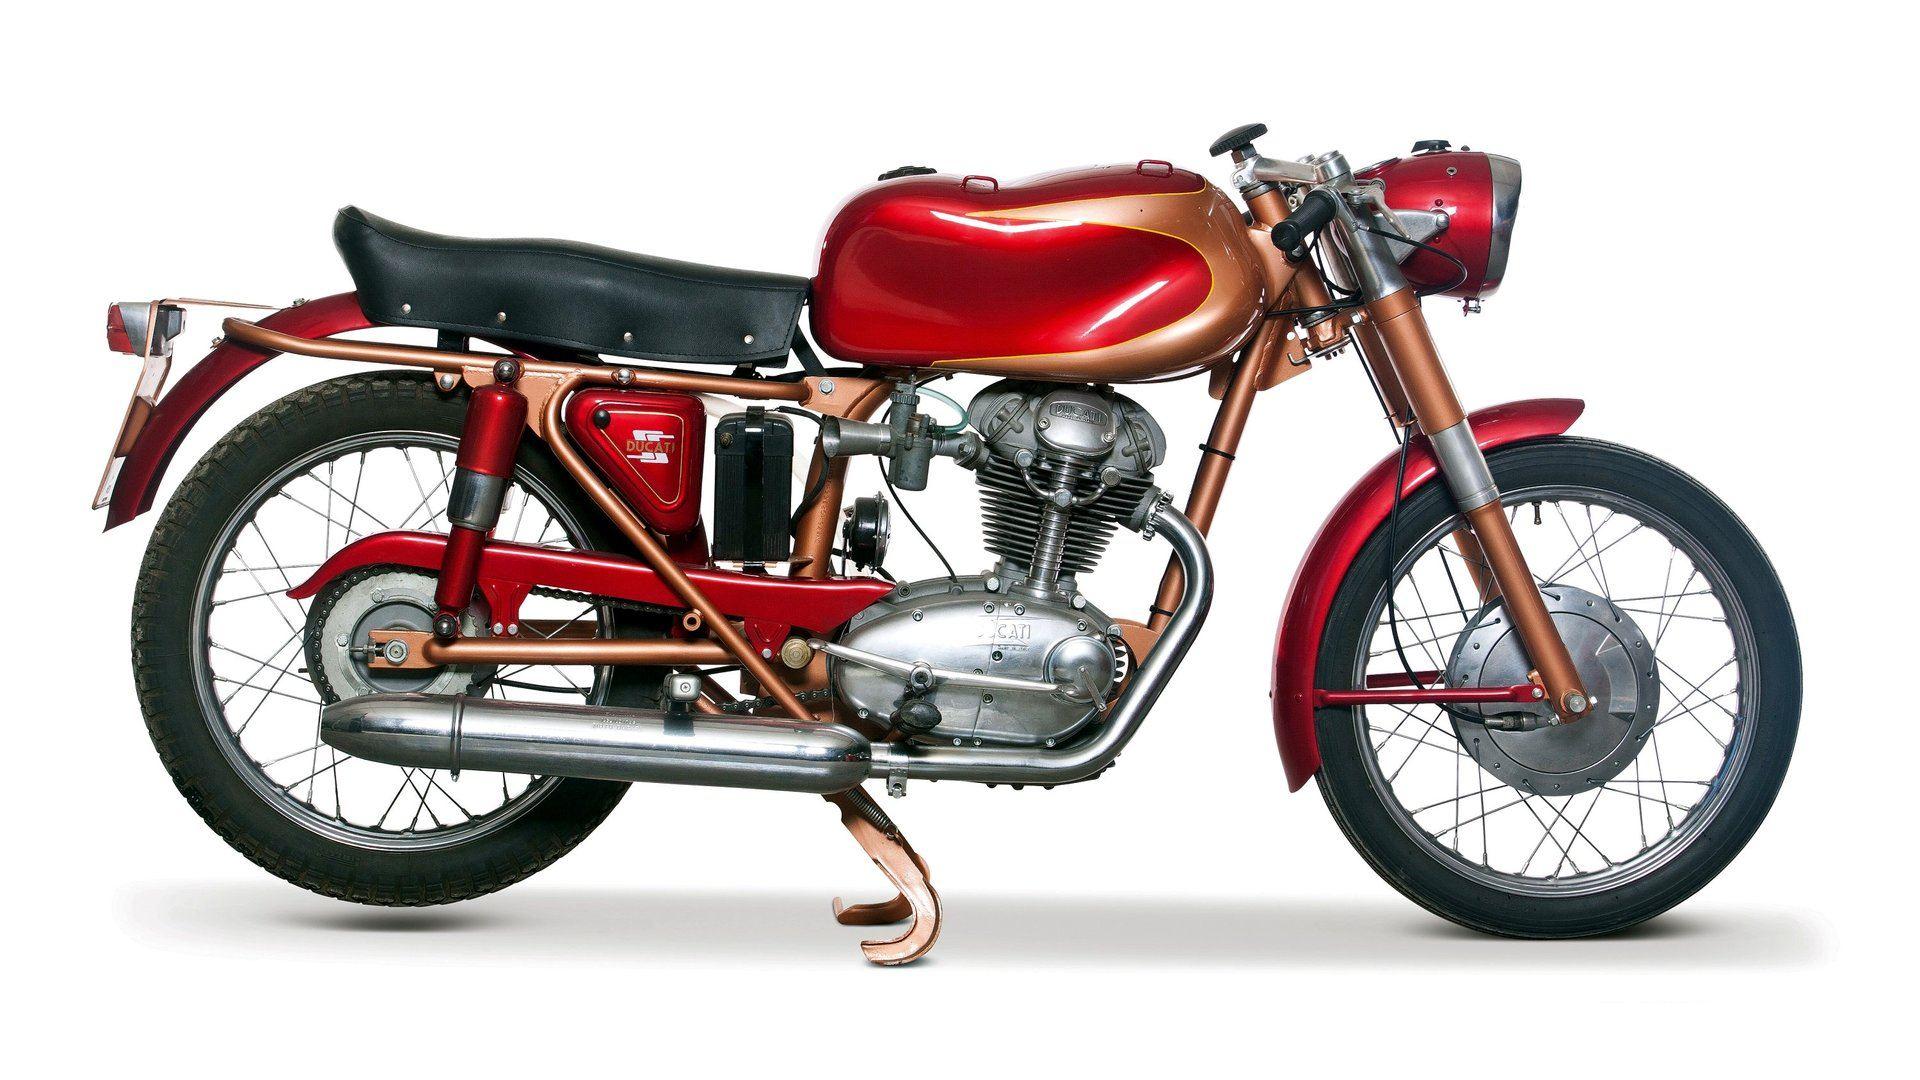 Ducati 175 Sport 1958